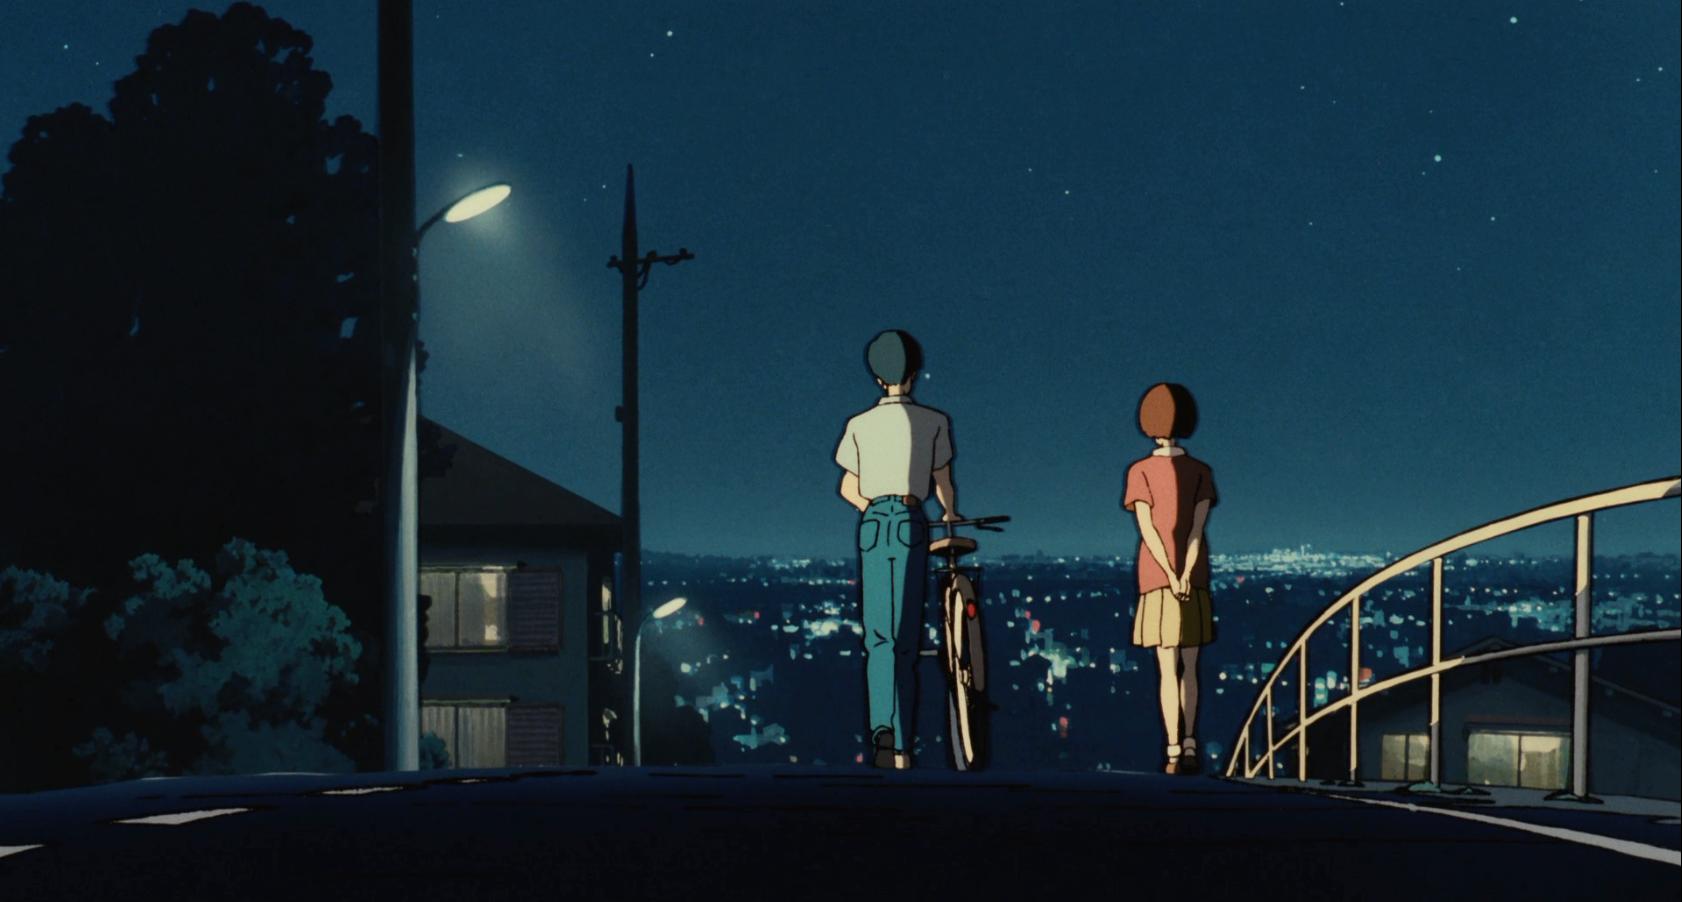 Pin by Juli VG on Ghibli Studio ghibli Heart wallpaper hd Ghibli 1682x902